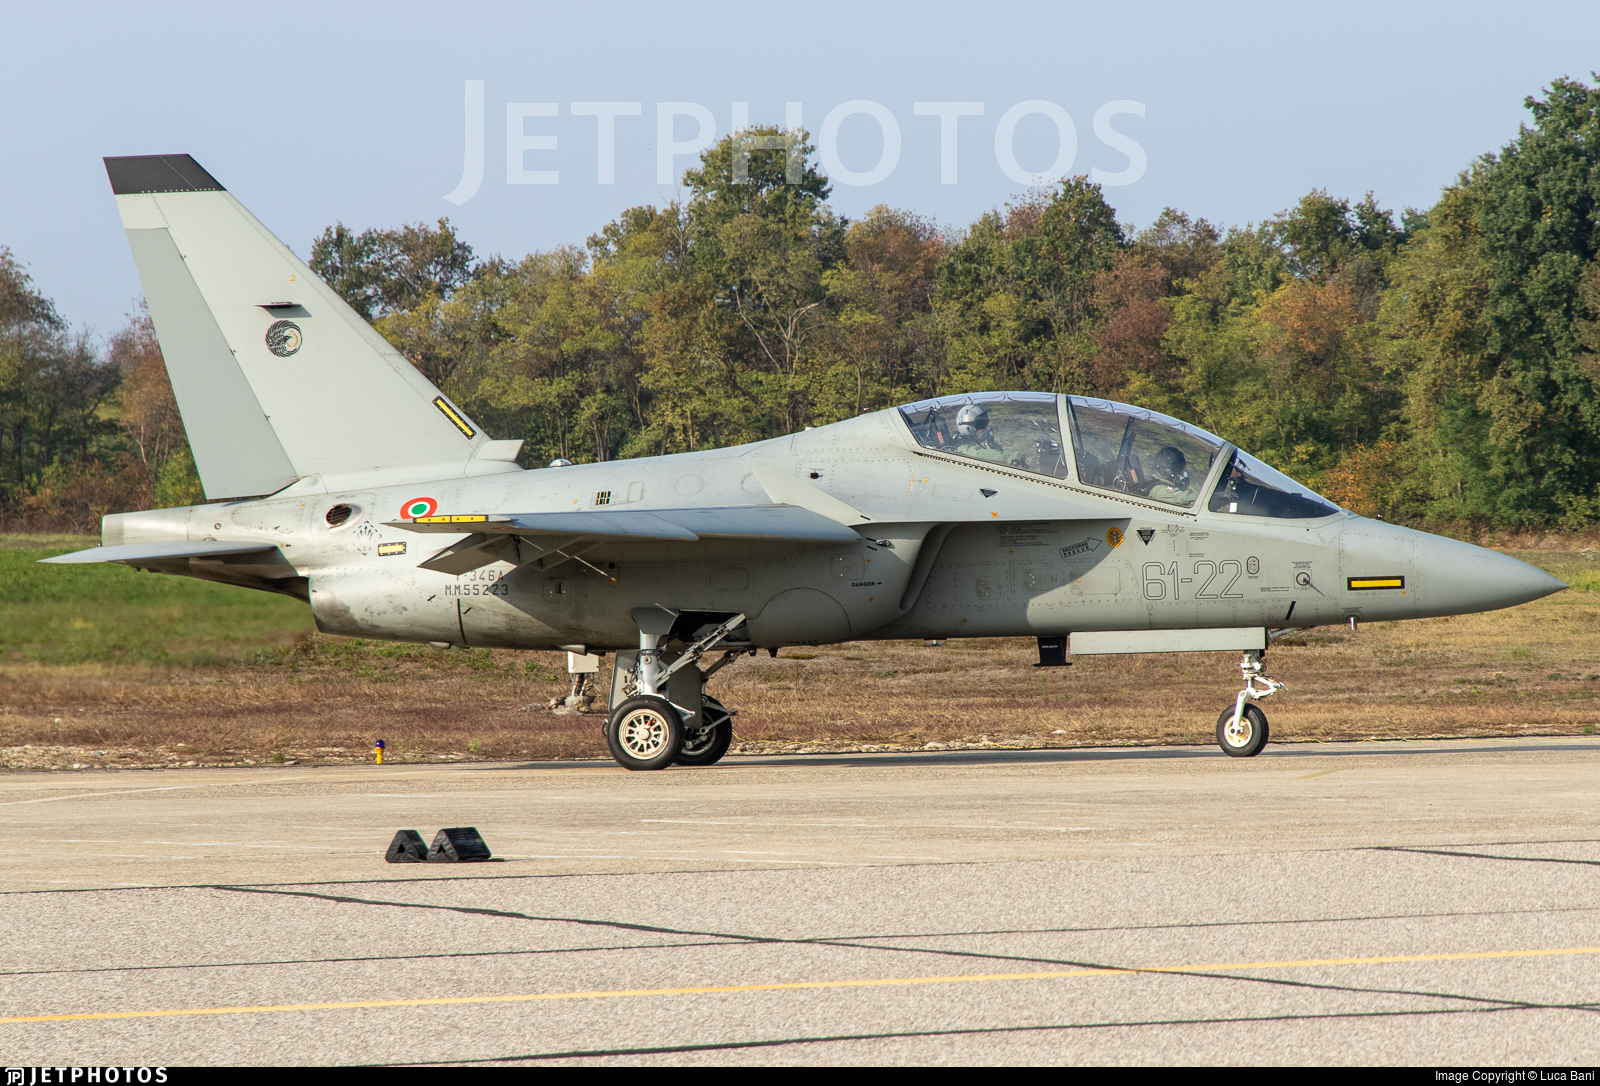 MM55223 - Alenia Aermacchi T-346A - Italy - Air Force